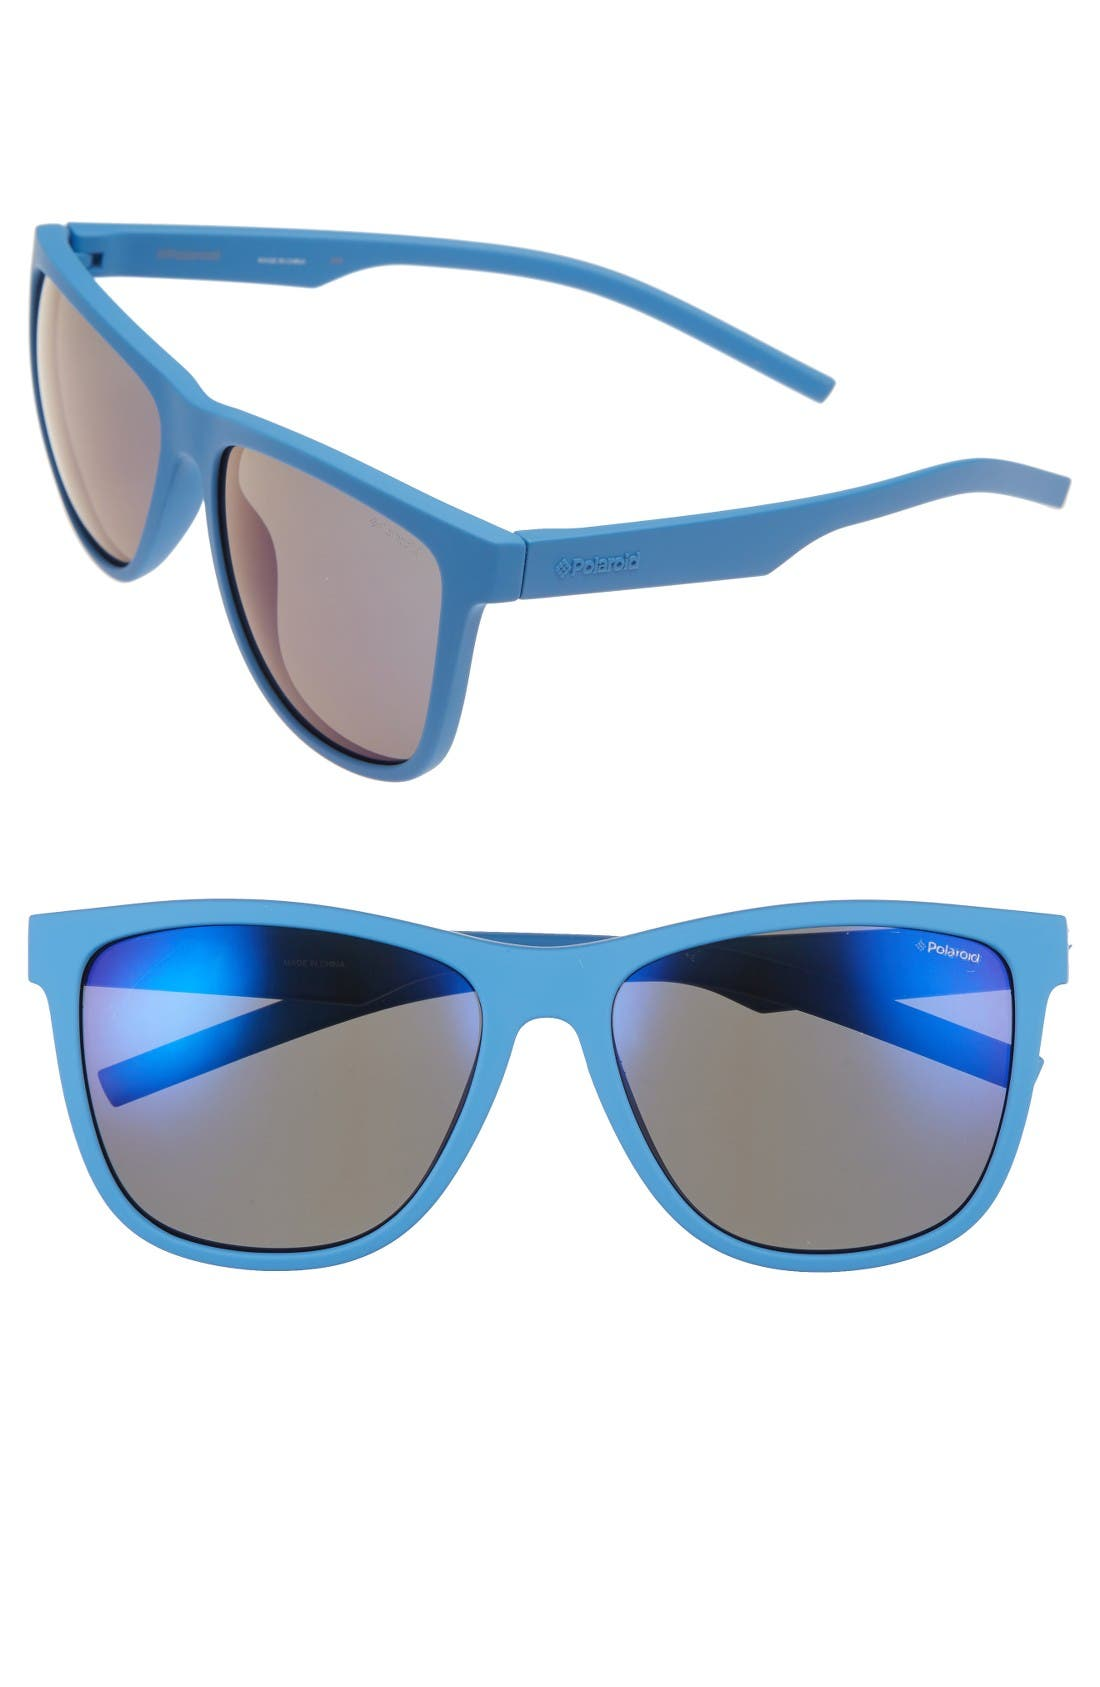 POLAROID EYEWEAR 6014/S 56mm Polarized Sunglasses